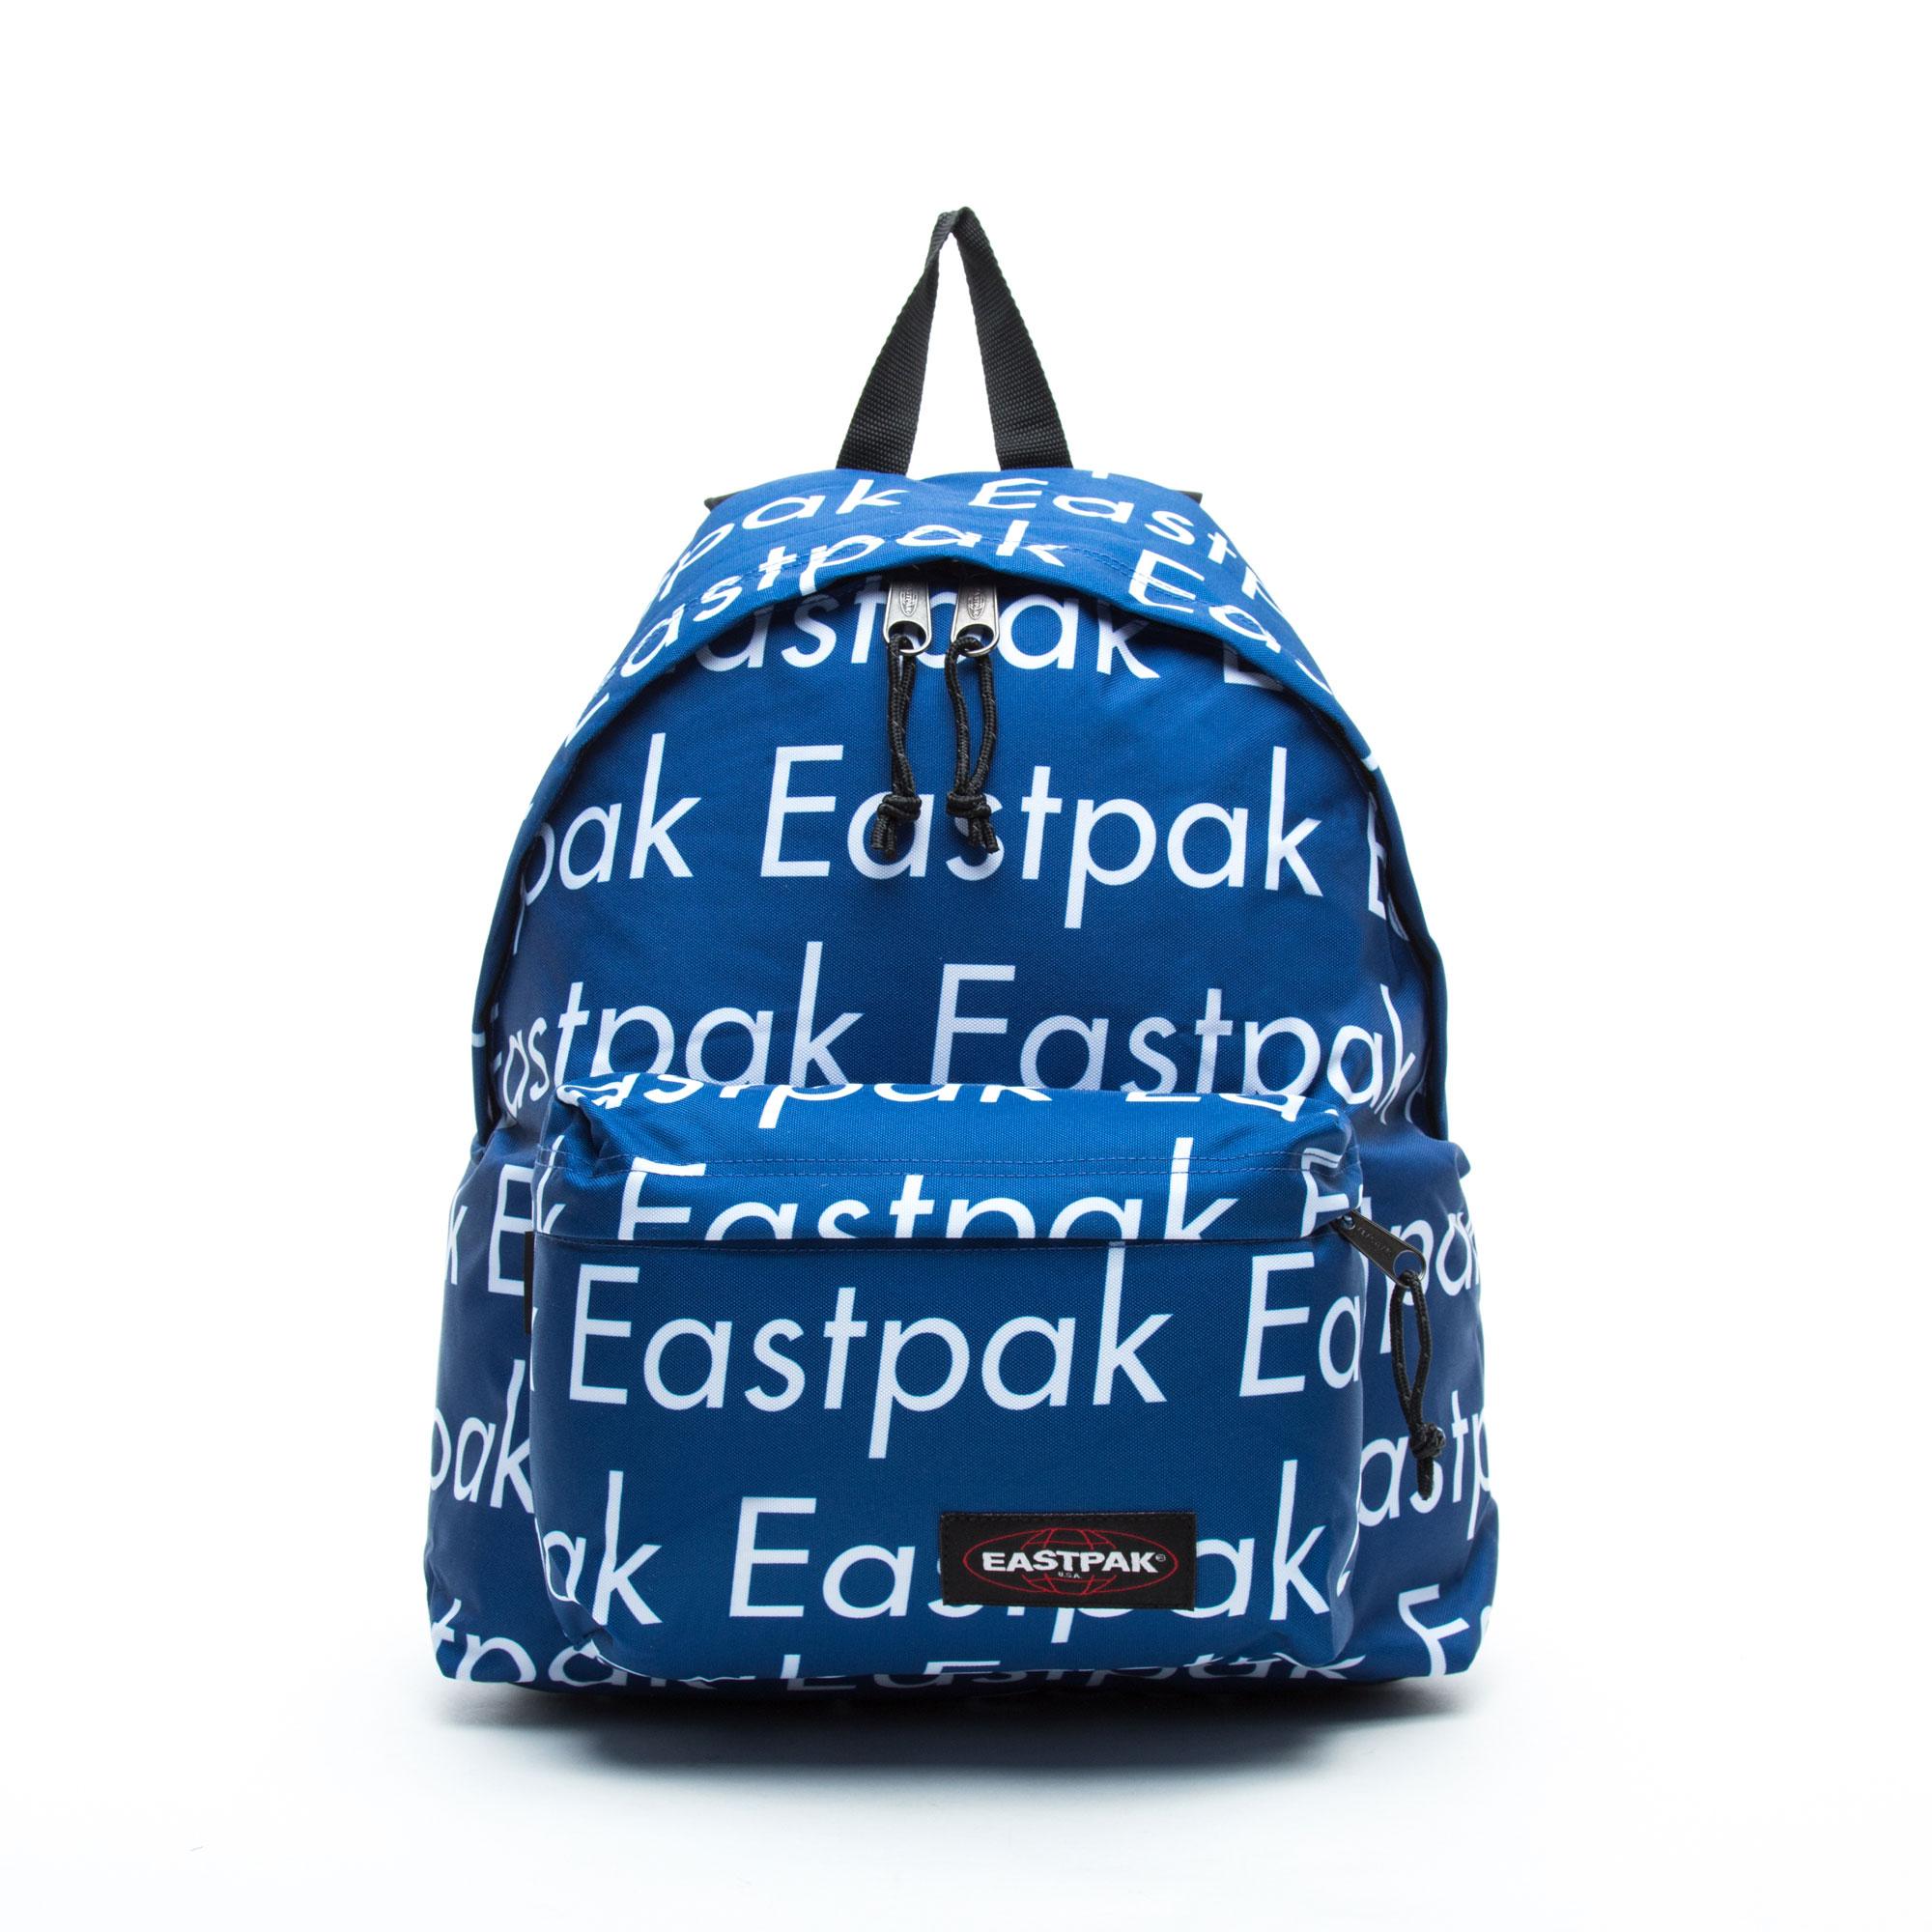 Eastpak Padded Pak'r Chatty Mavi Sırt Çantası